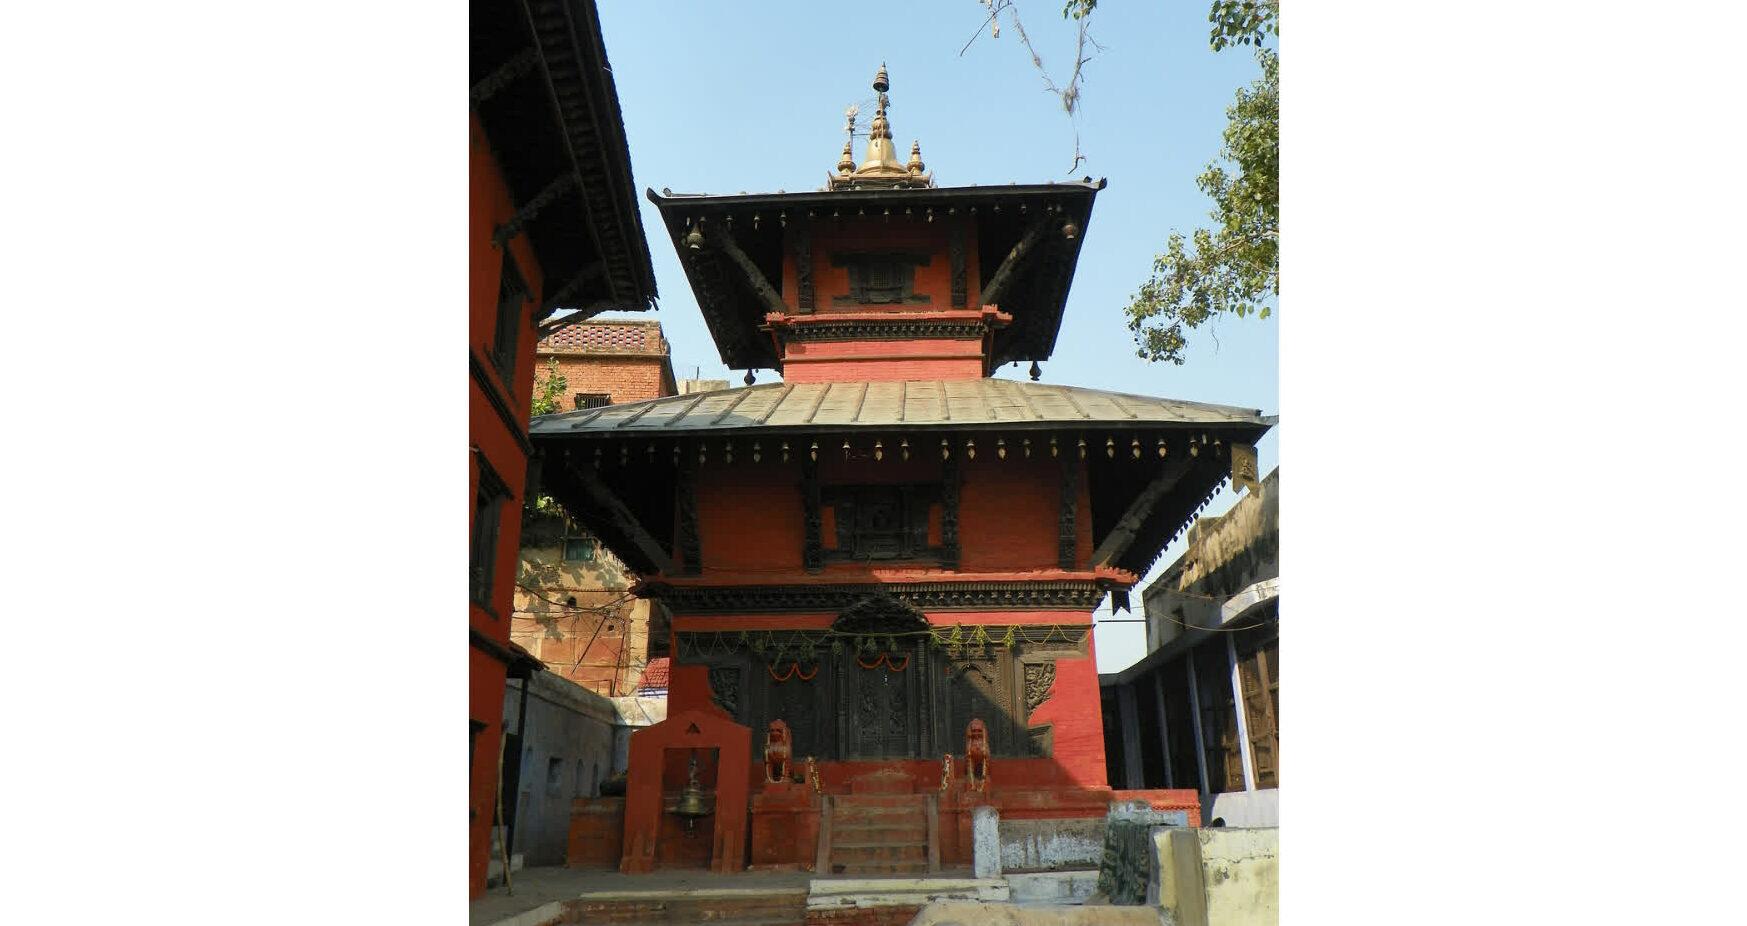 Pashupatinath Temple: A Piece of Nepal in Varanasi